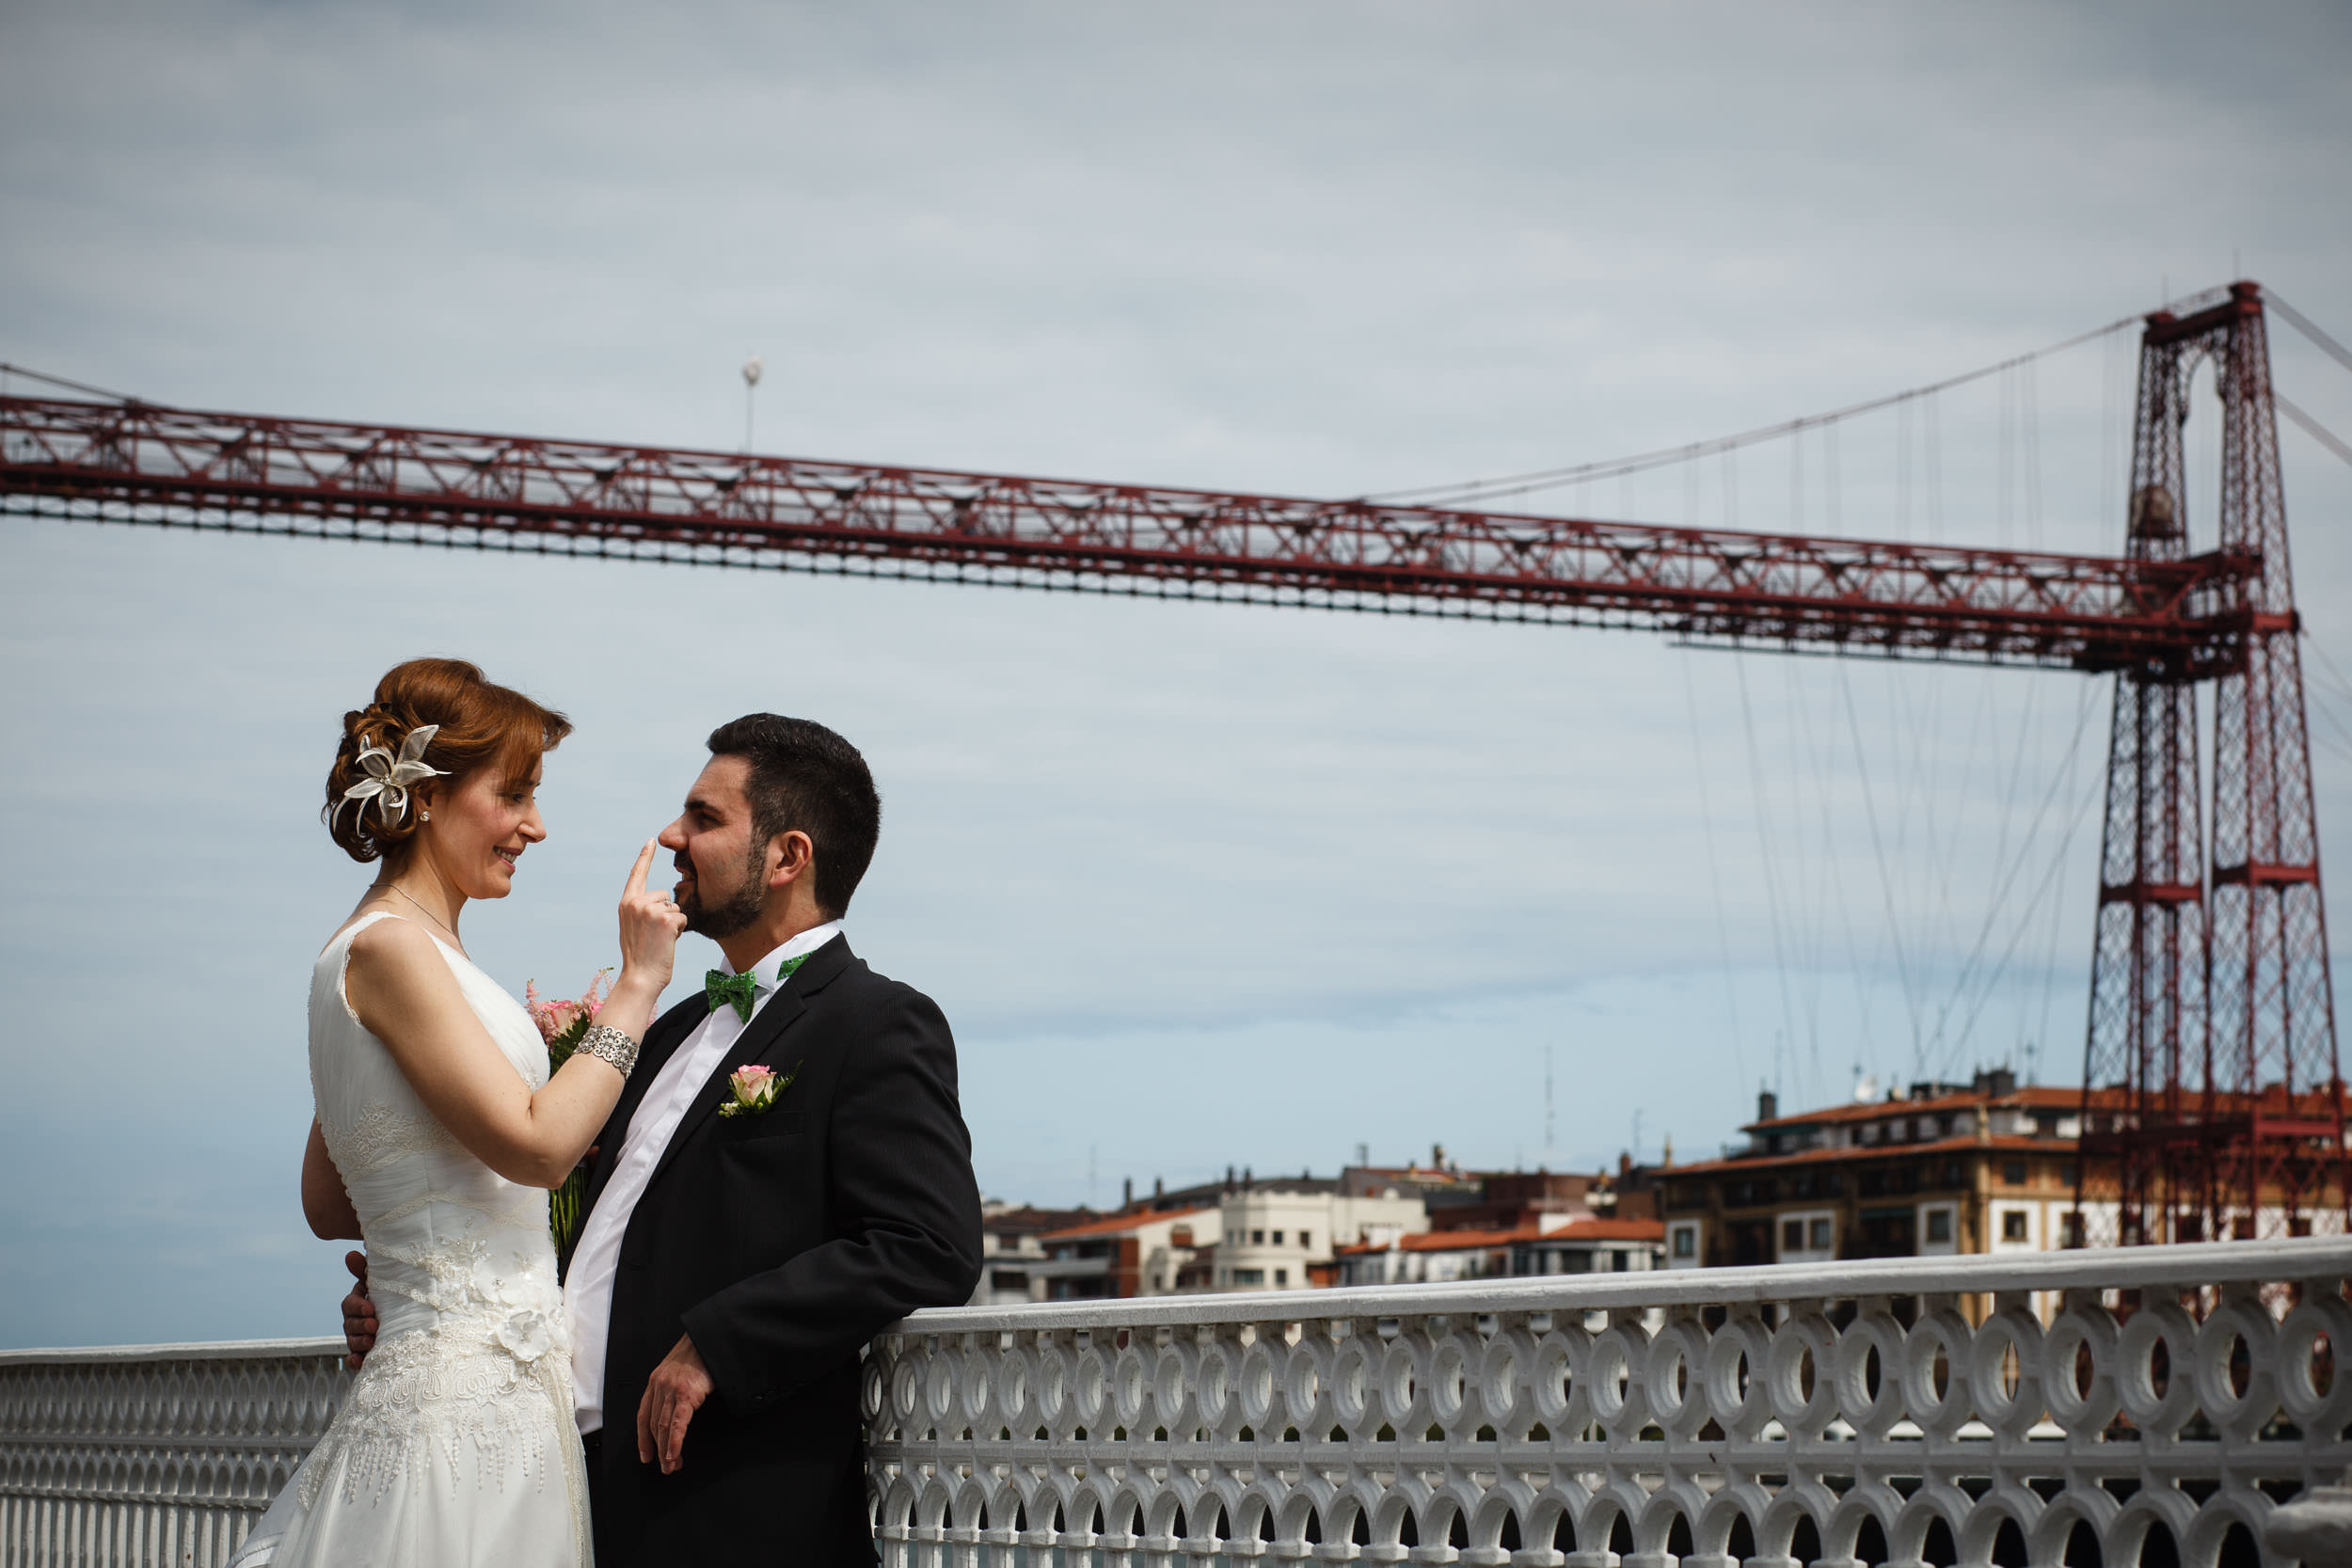 Engagement photography in Portugalete, Basque Country, Spain - James Sturcke  Photographer | sturcke.org_007.jpg